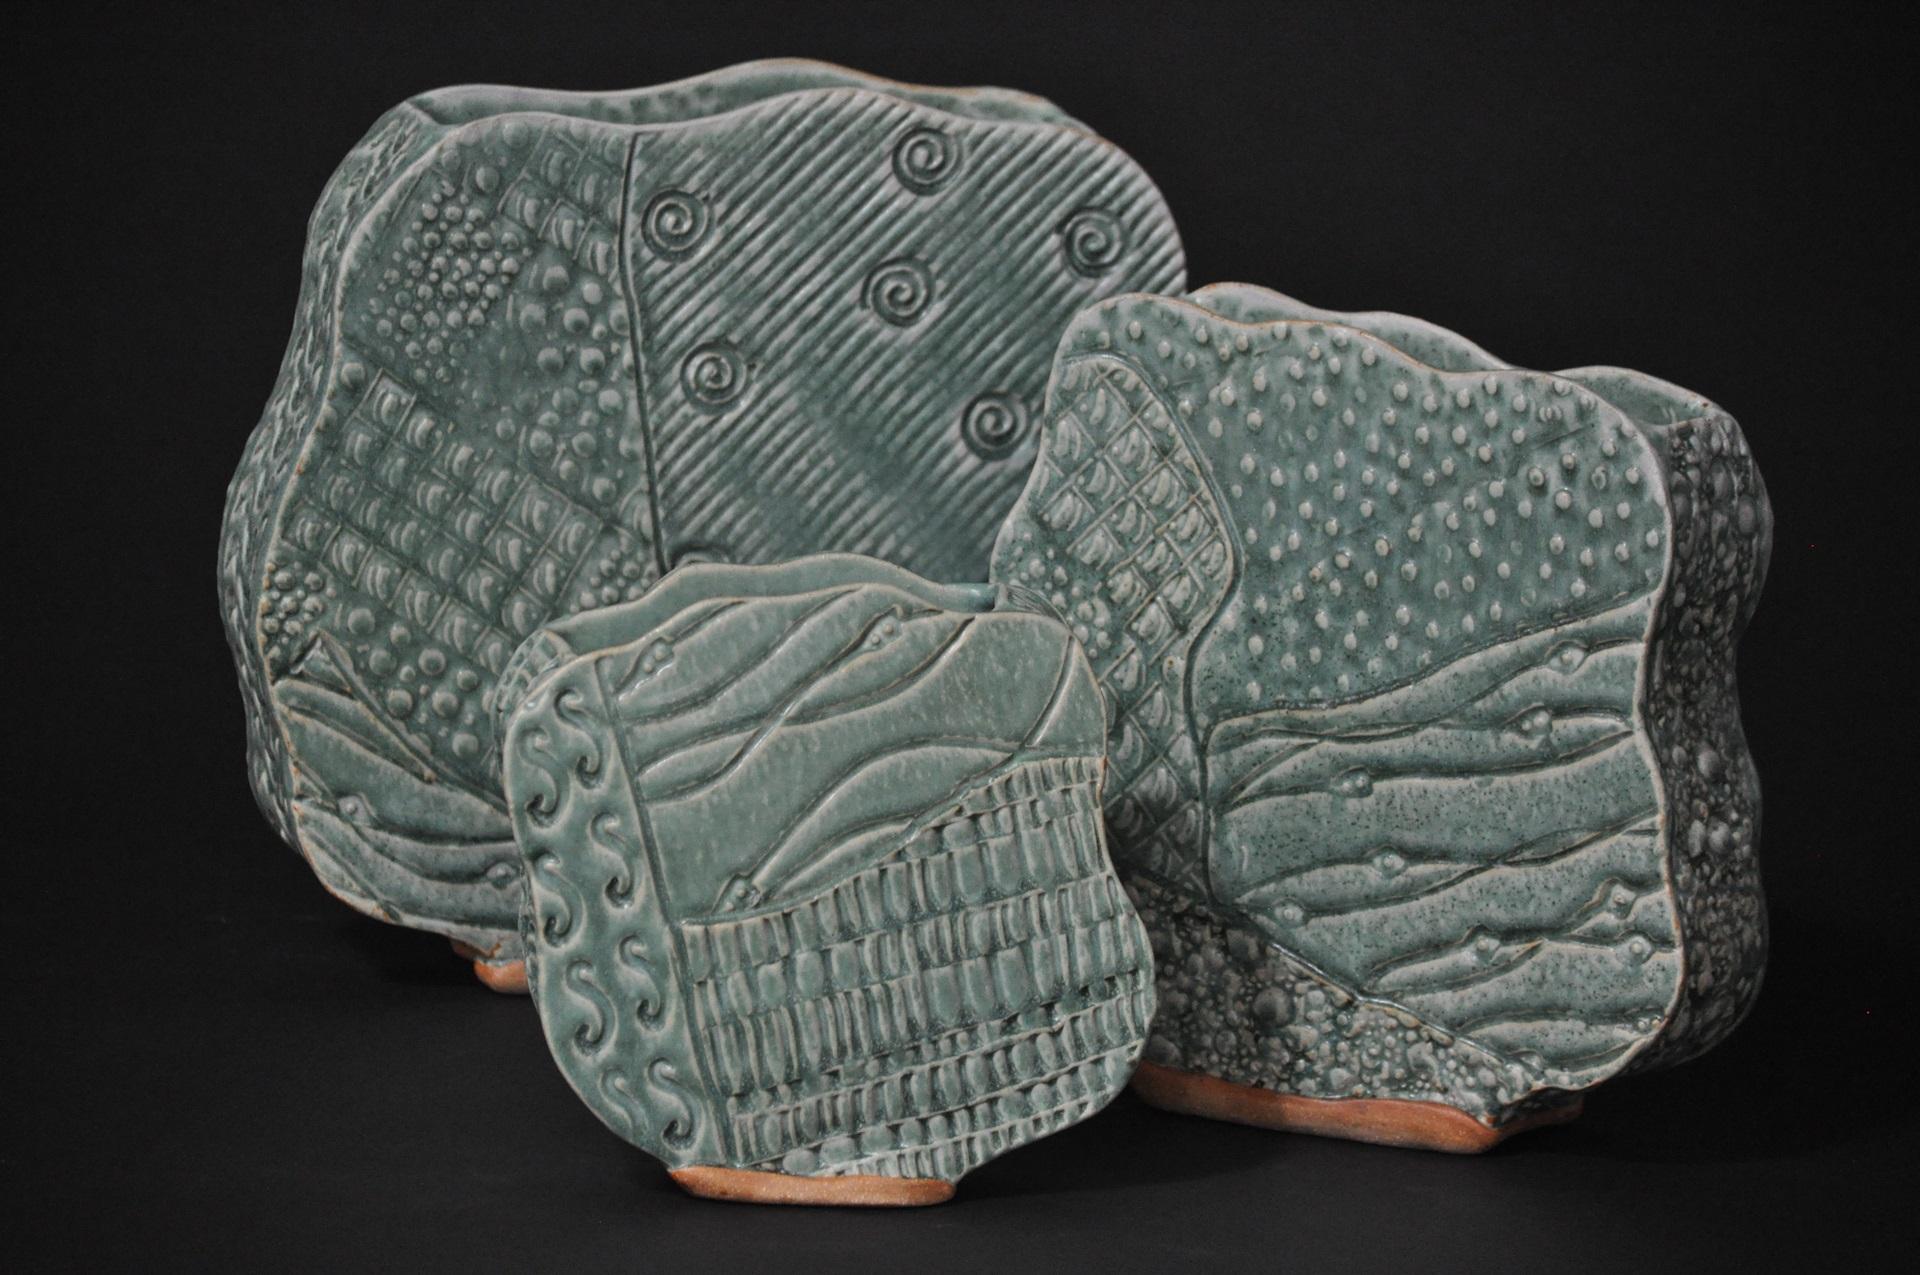 Textured Pots